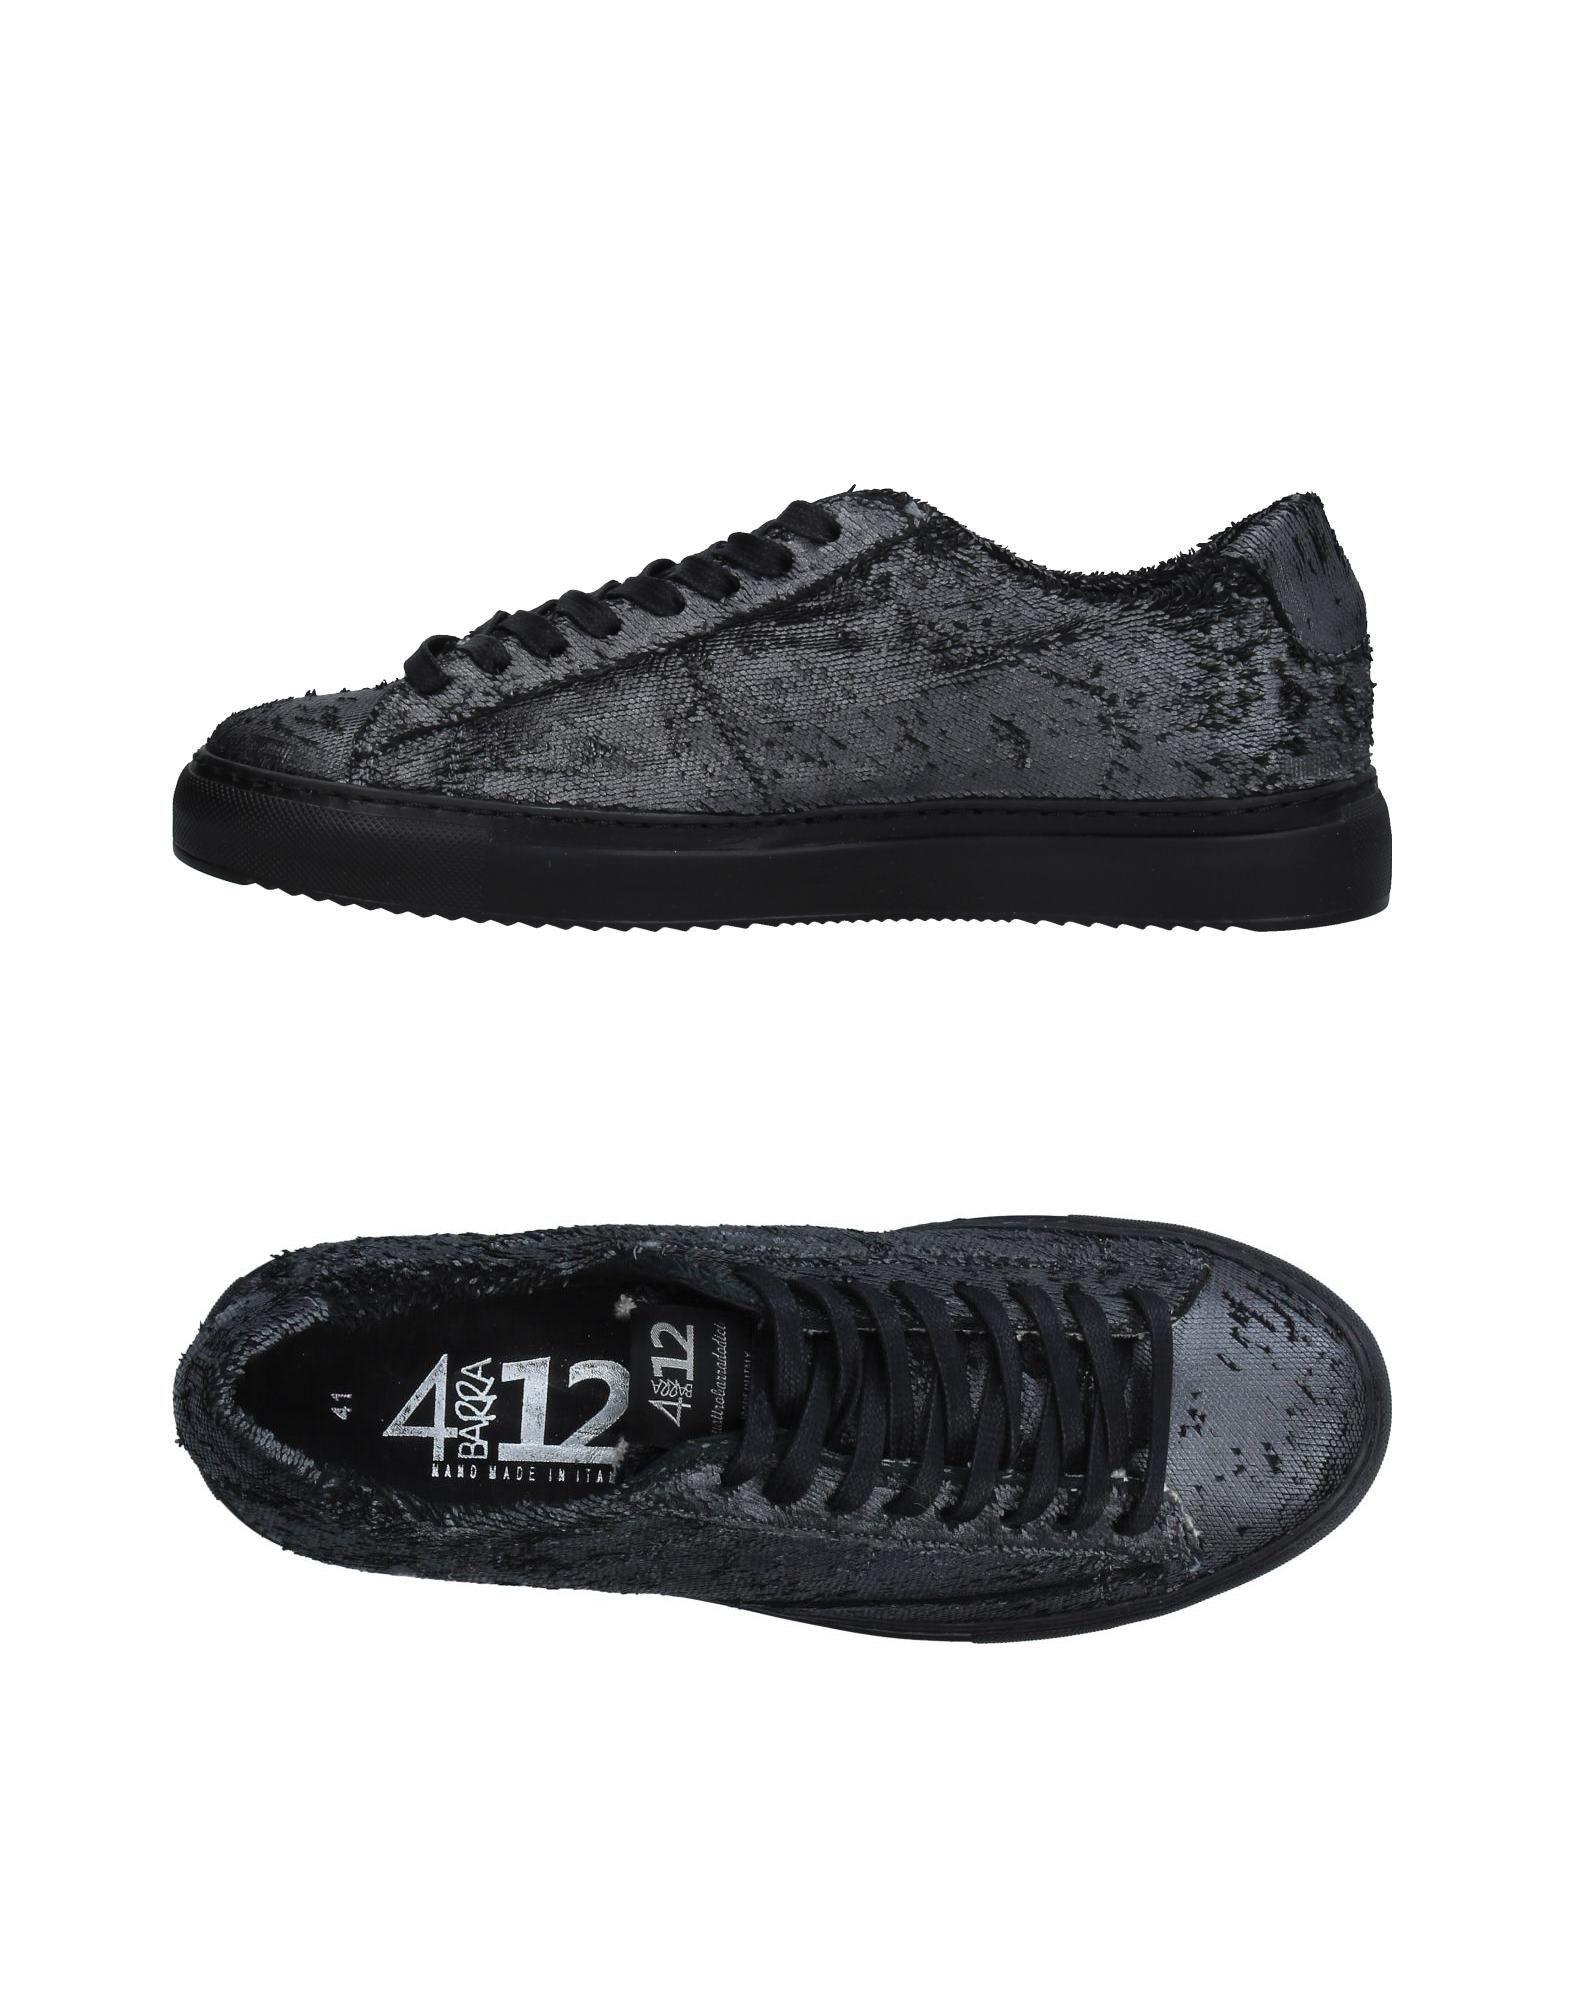 Quattrobarradodici Sneakers Heiße Damen  11271400II Heiße Sneakers Schuhe 17fbd7